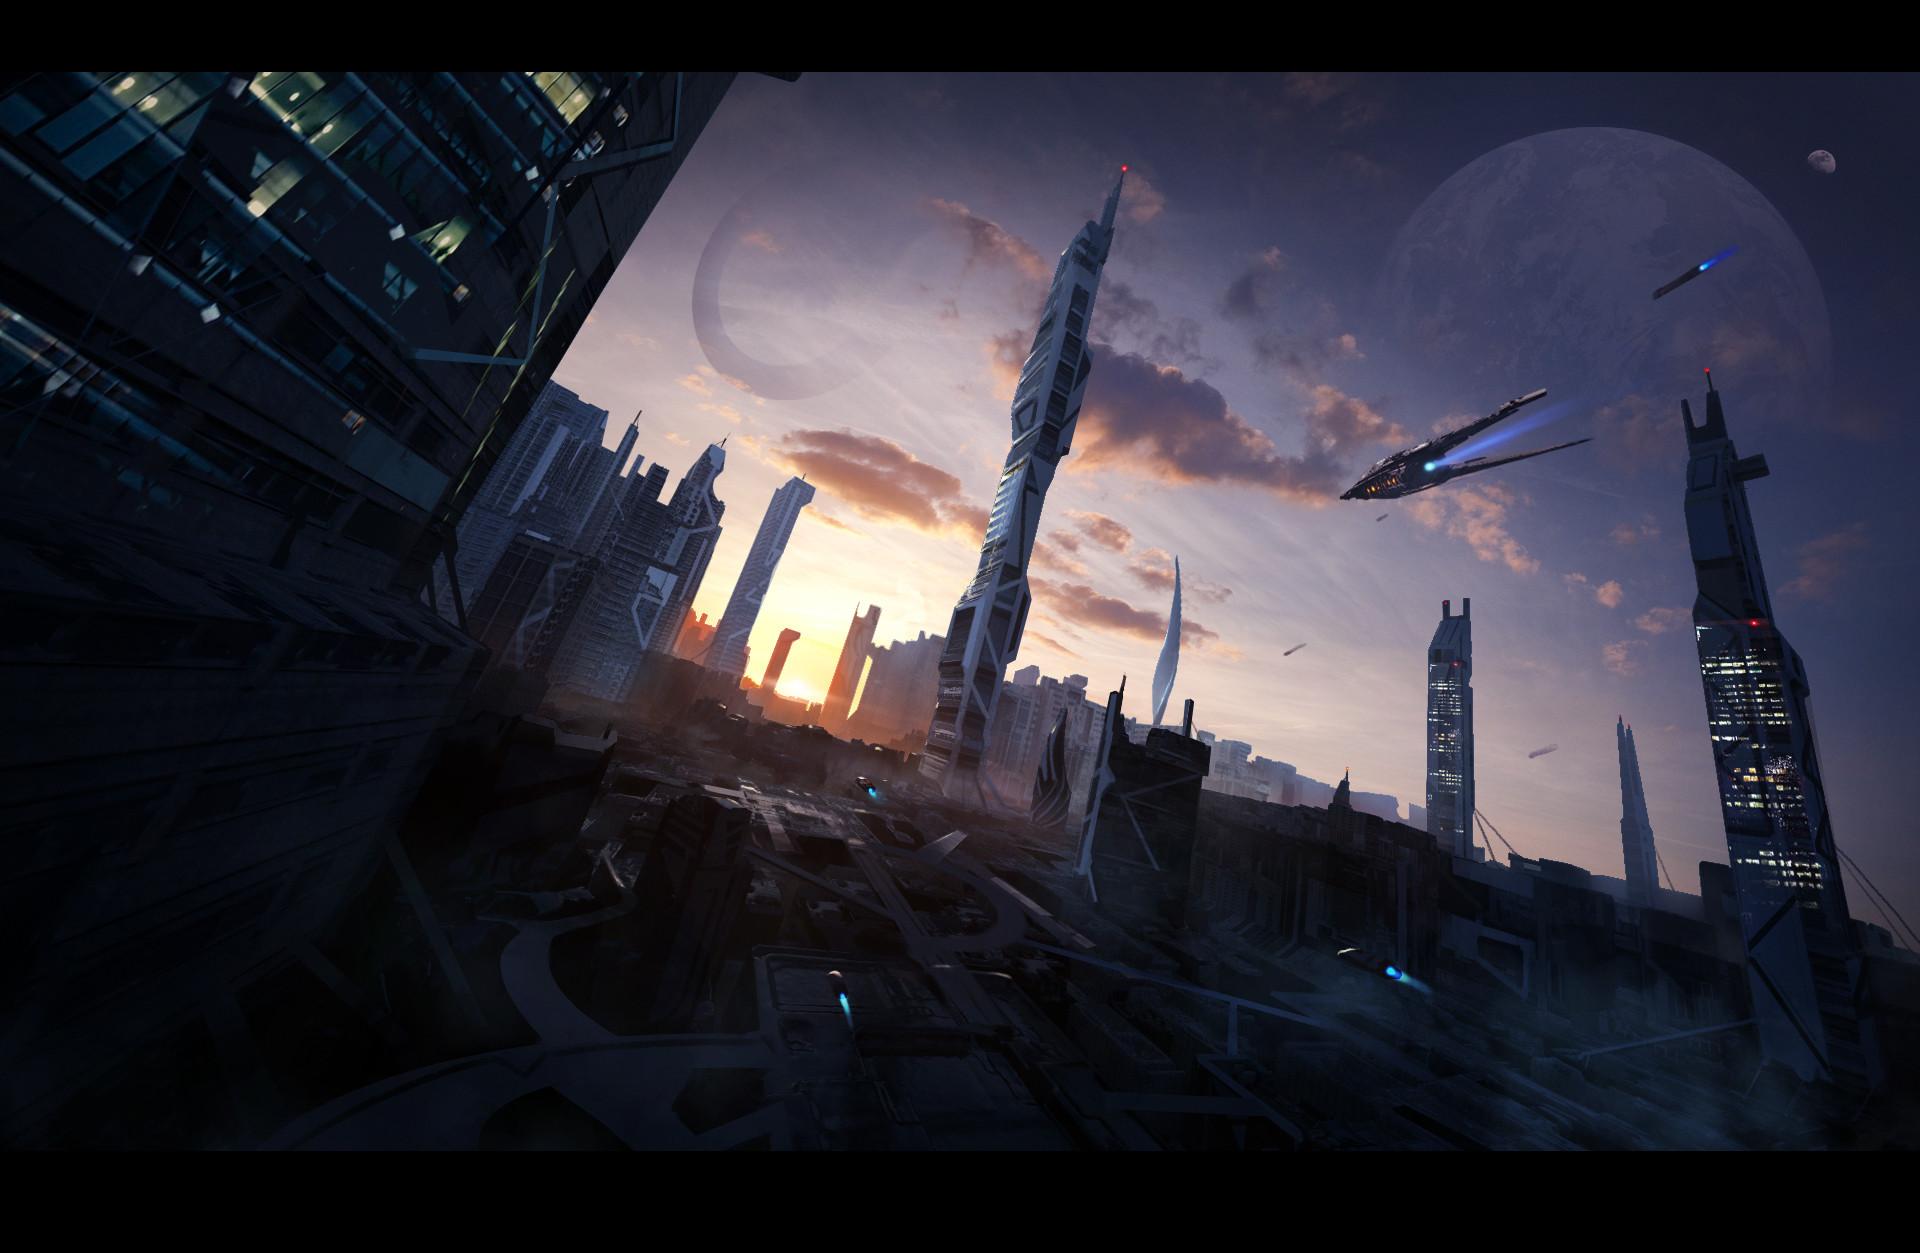 Sathish kumar futuristic cityscape final hw1